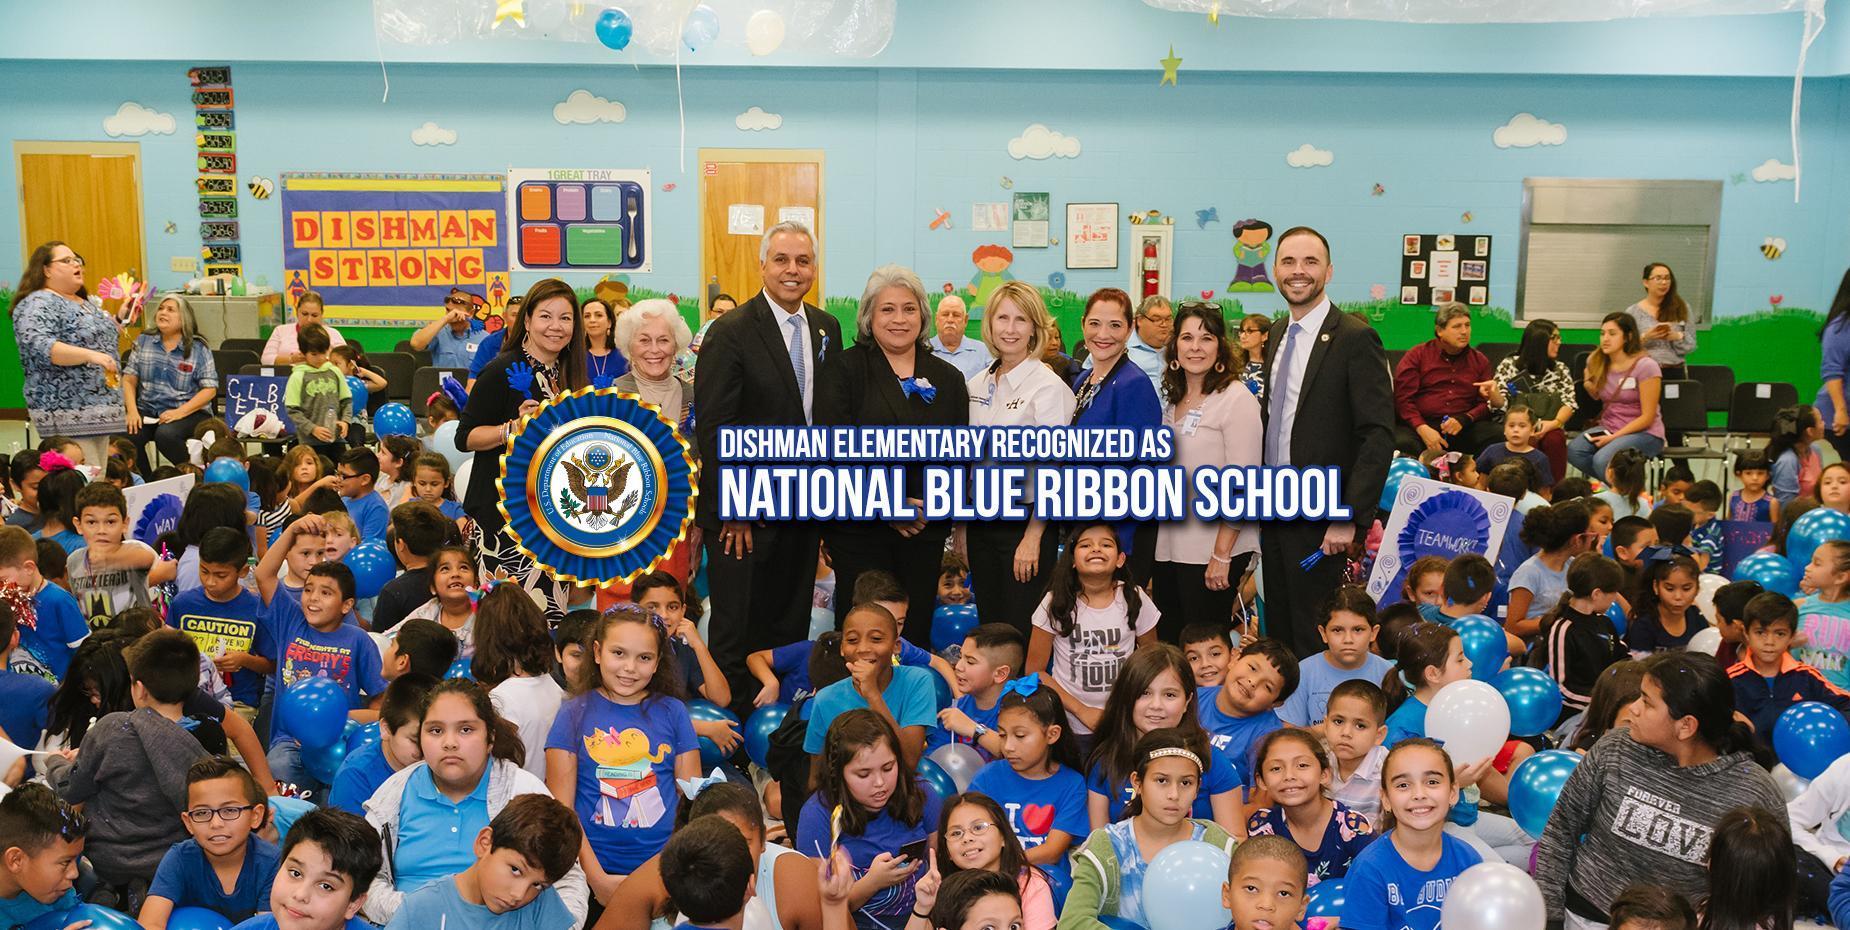 Dishman Elementary recognized as National Blue Ribbon School